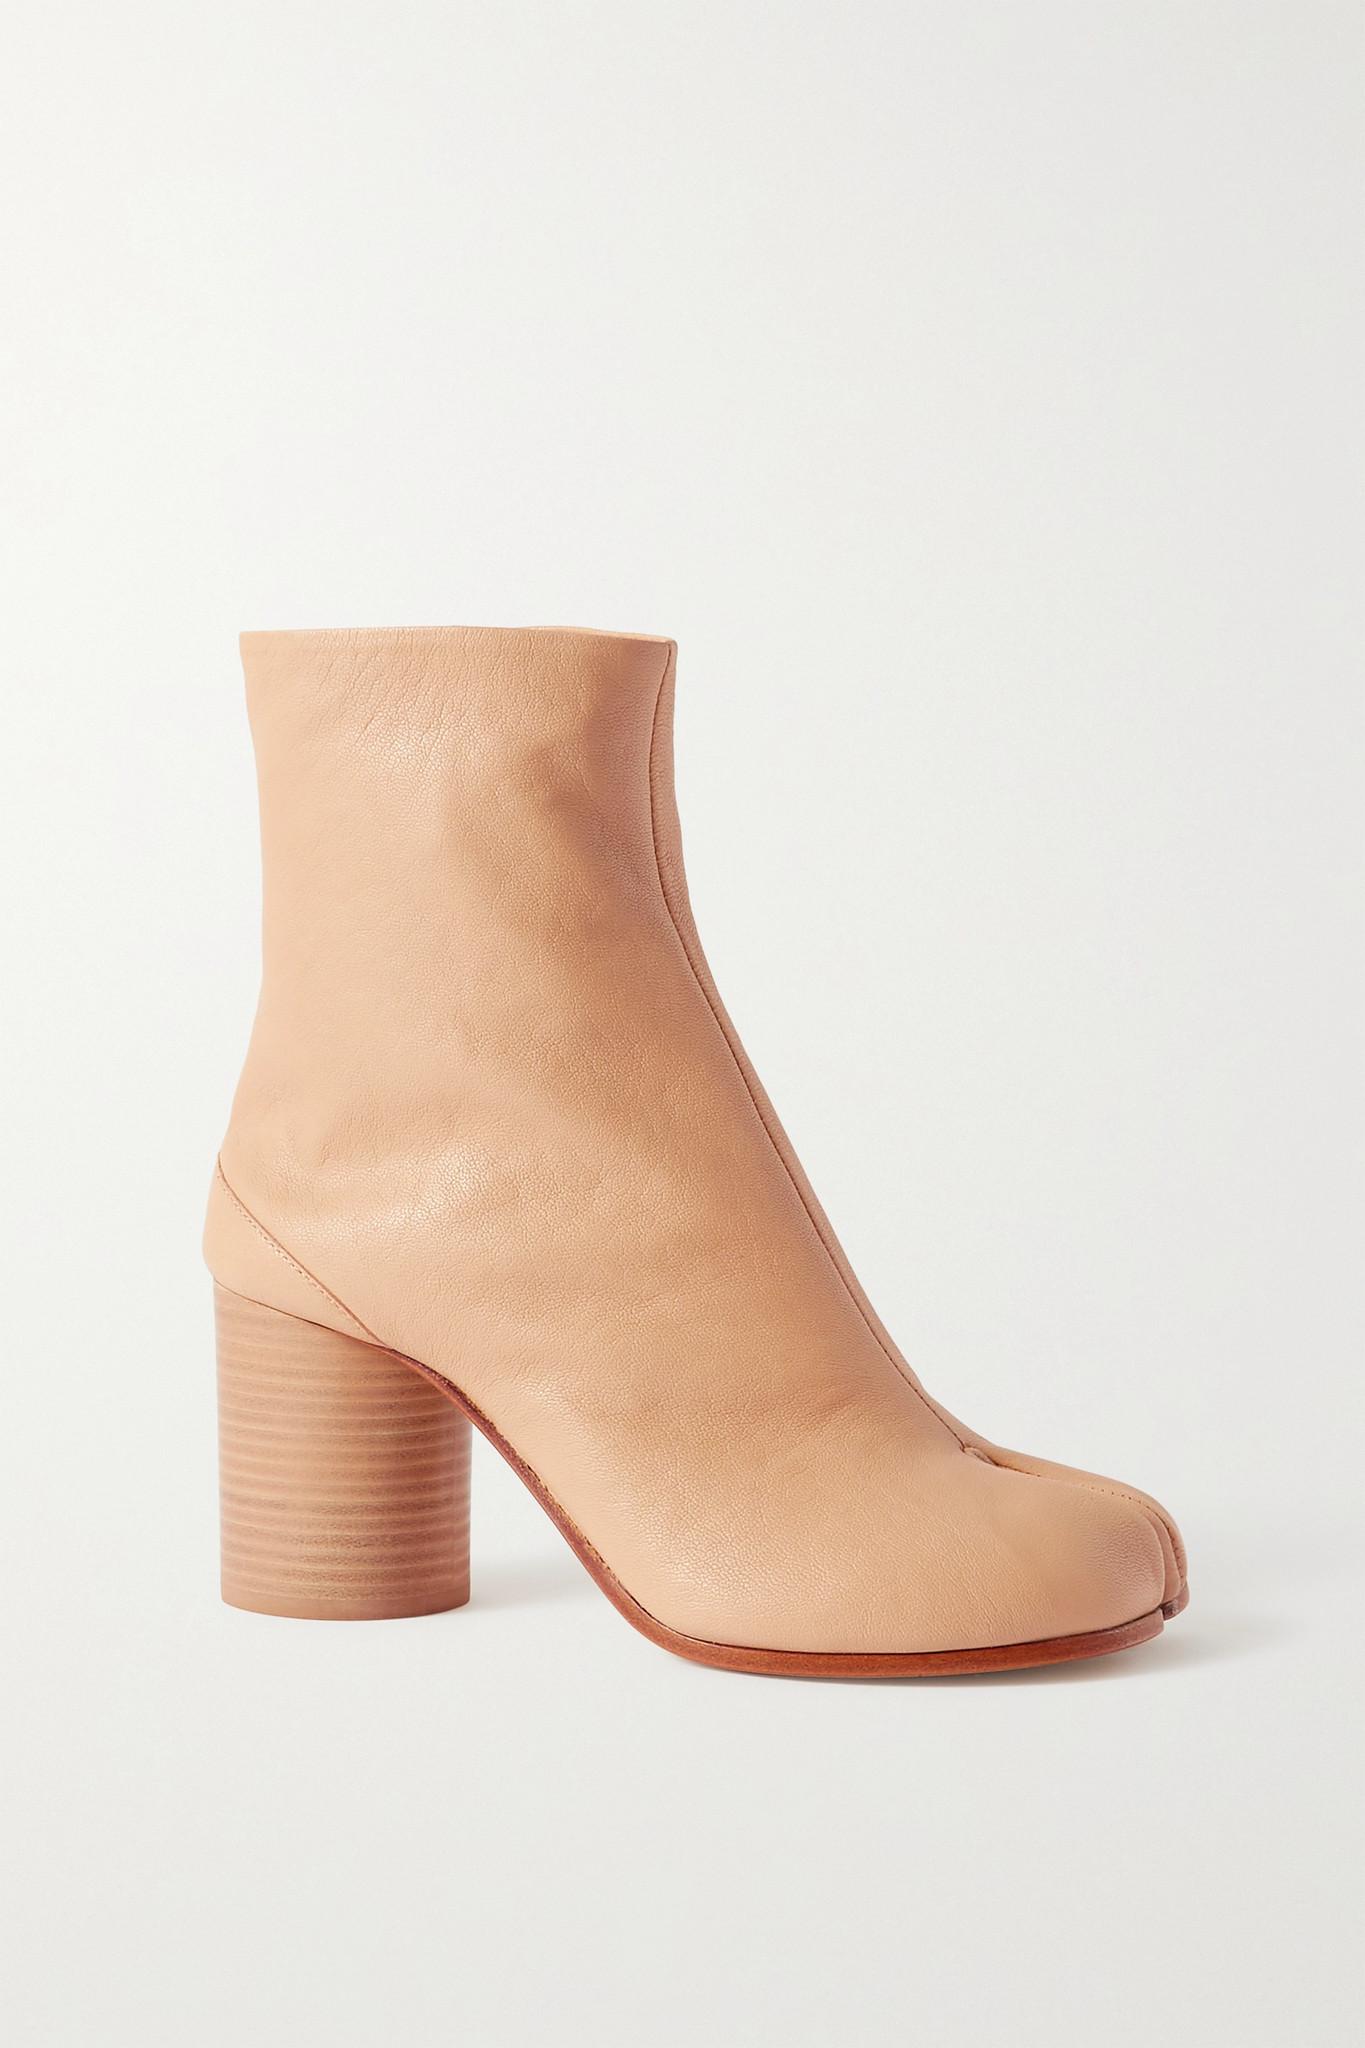 MAISON MARGIELA - Tabi 分趾皮革踝靴 - 中性色 - IT36.5